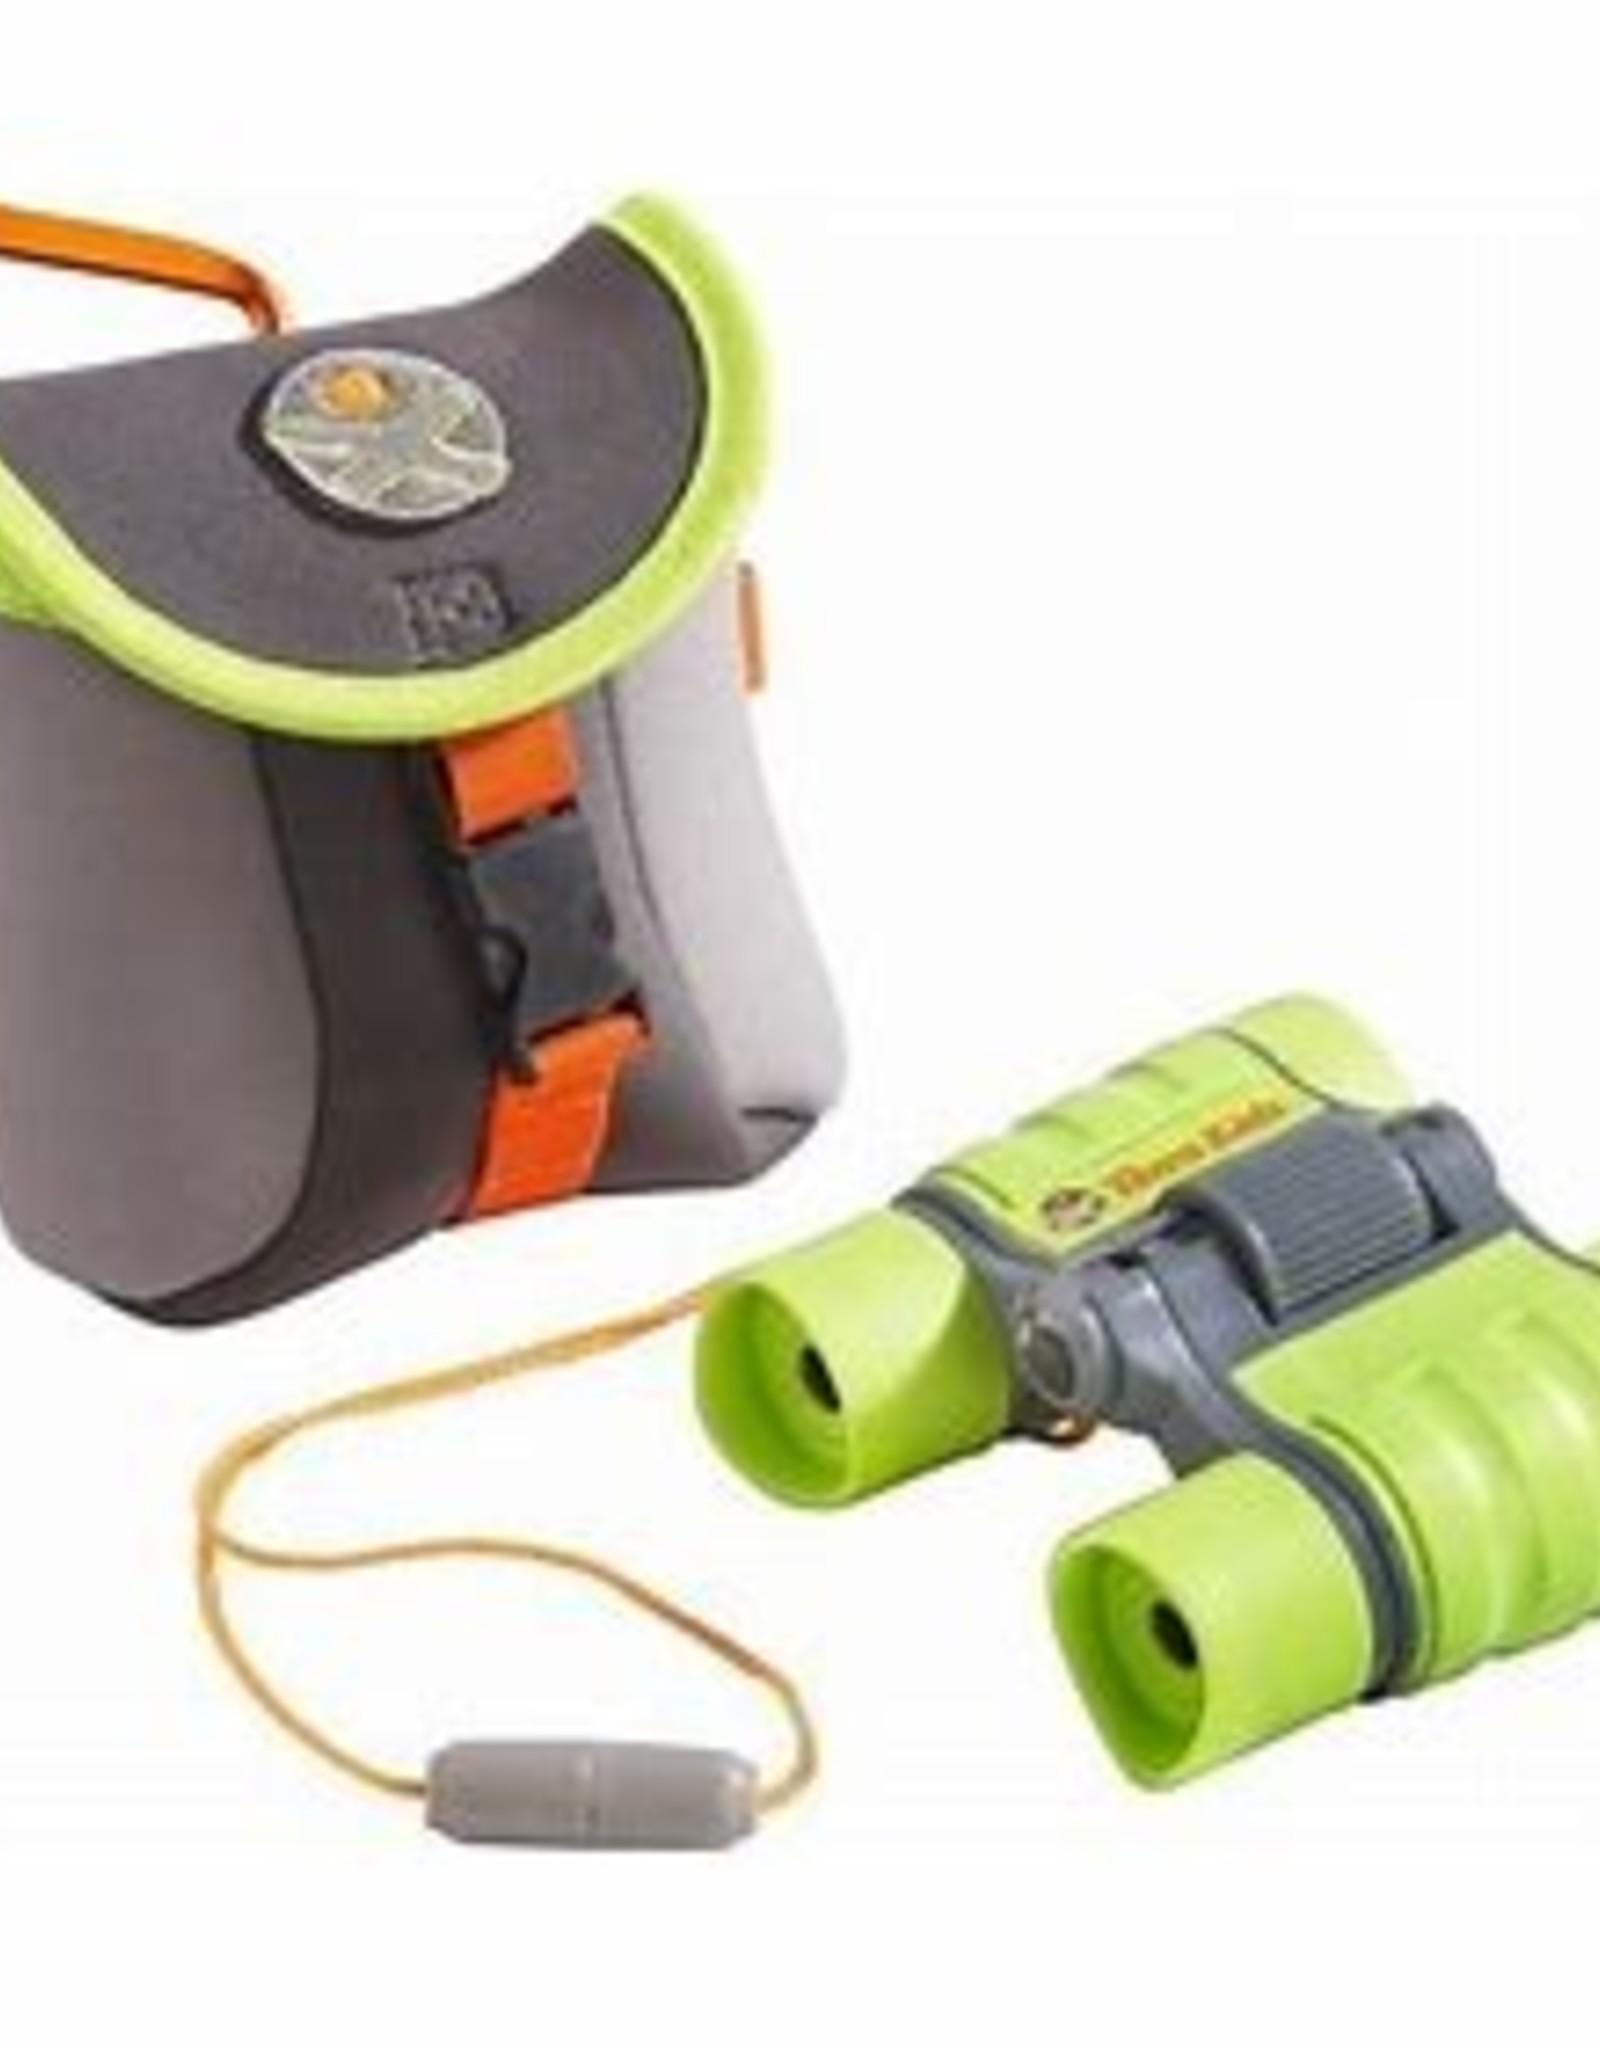 Haba Terra Kids - Binoculars with Bag